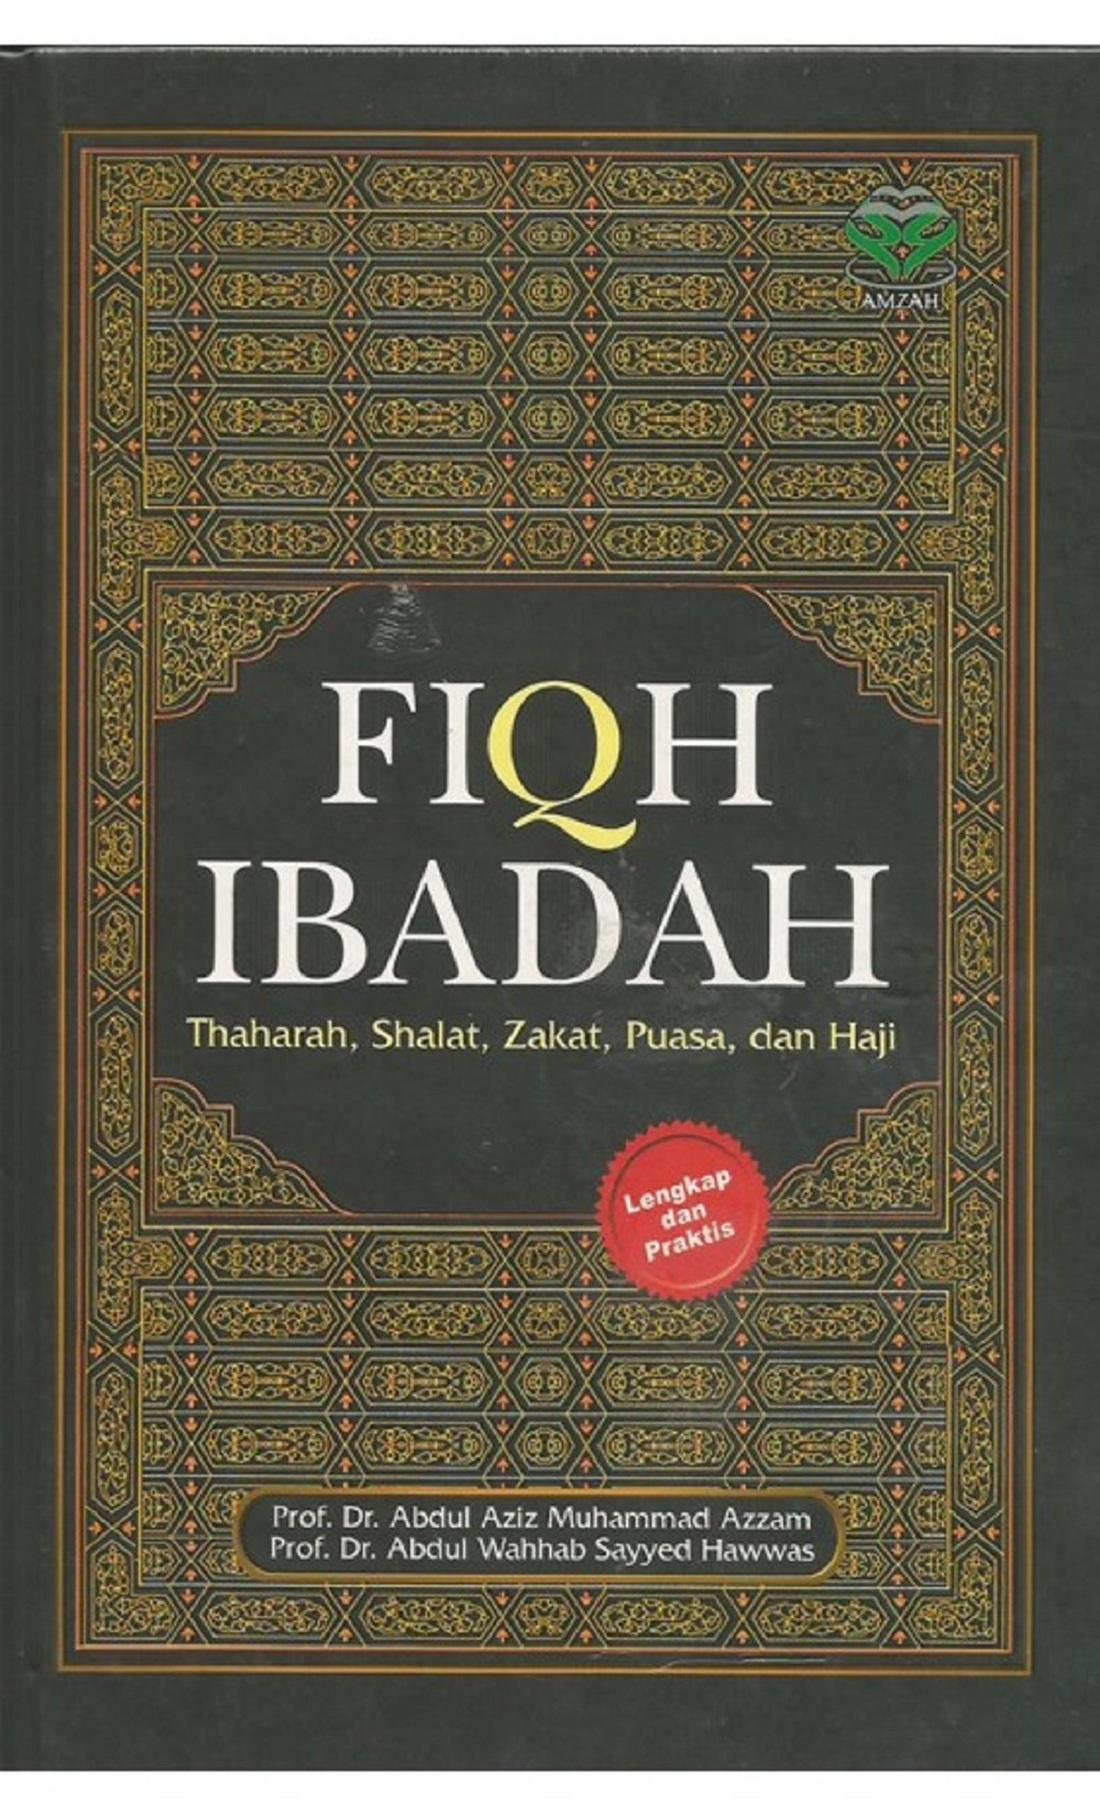 Fiqih Ibadah - Abdul Aziz M. Azzam By Metro Bookstore Malang.